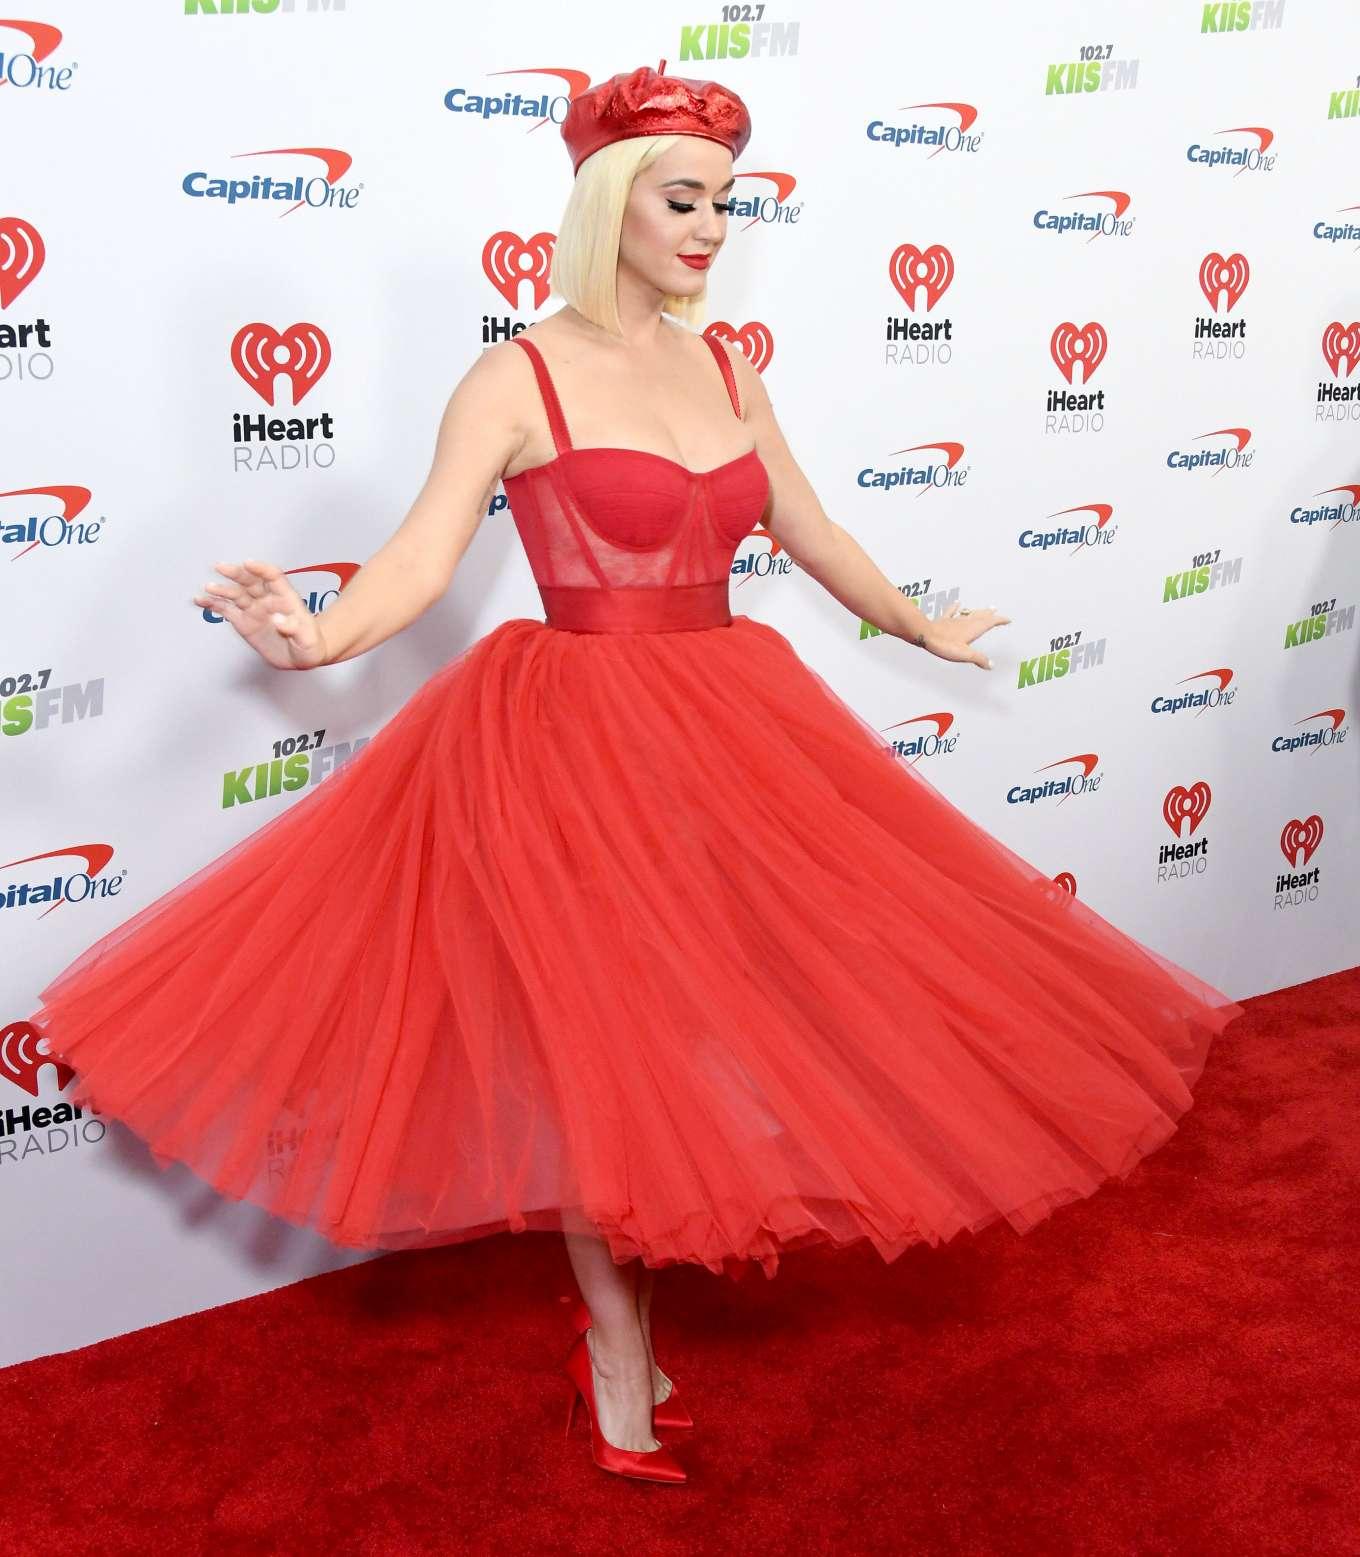 Katy Perry 2019 : Katy Perry – 2019 KIIS FMs iHeartRadio Jingle Ball-27